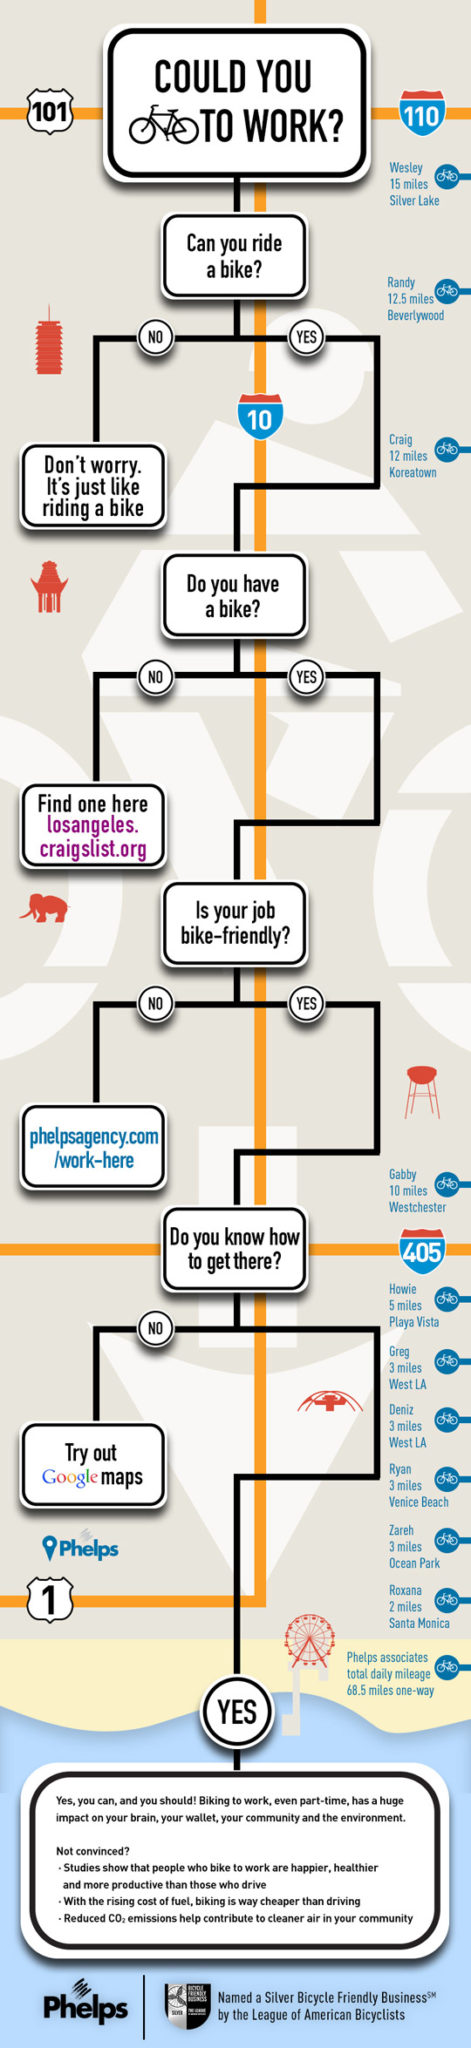 Phelps-Bike-InfoGraphic